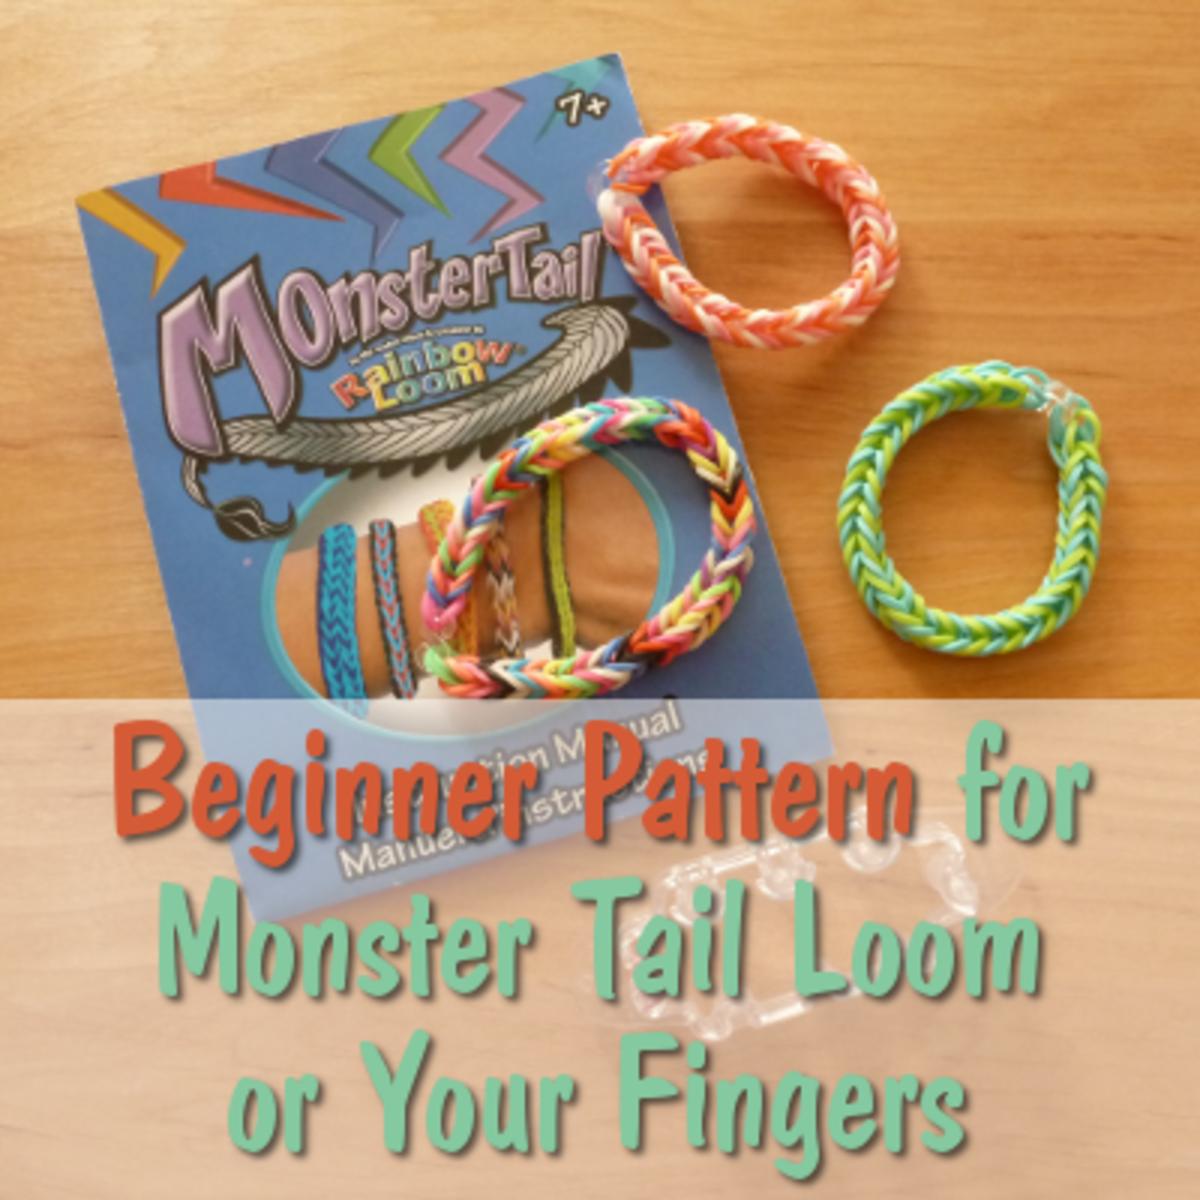 Beginner rubber band bracelet pattern for the MonsterTail Loom or for your fingers